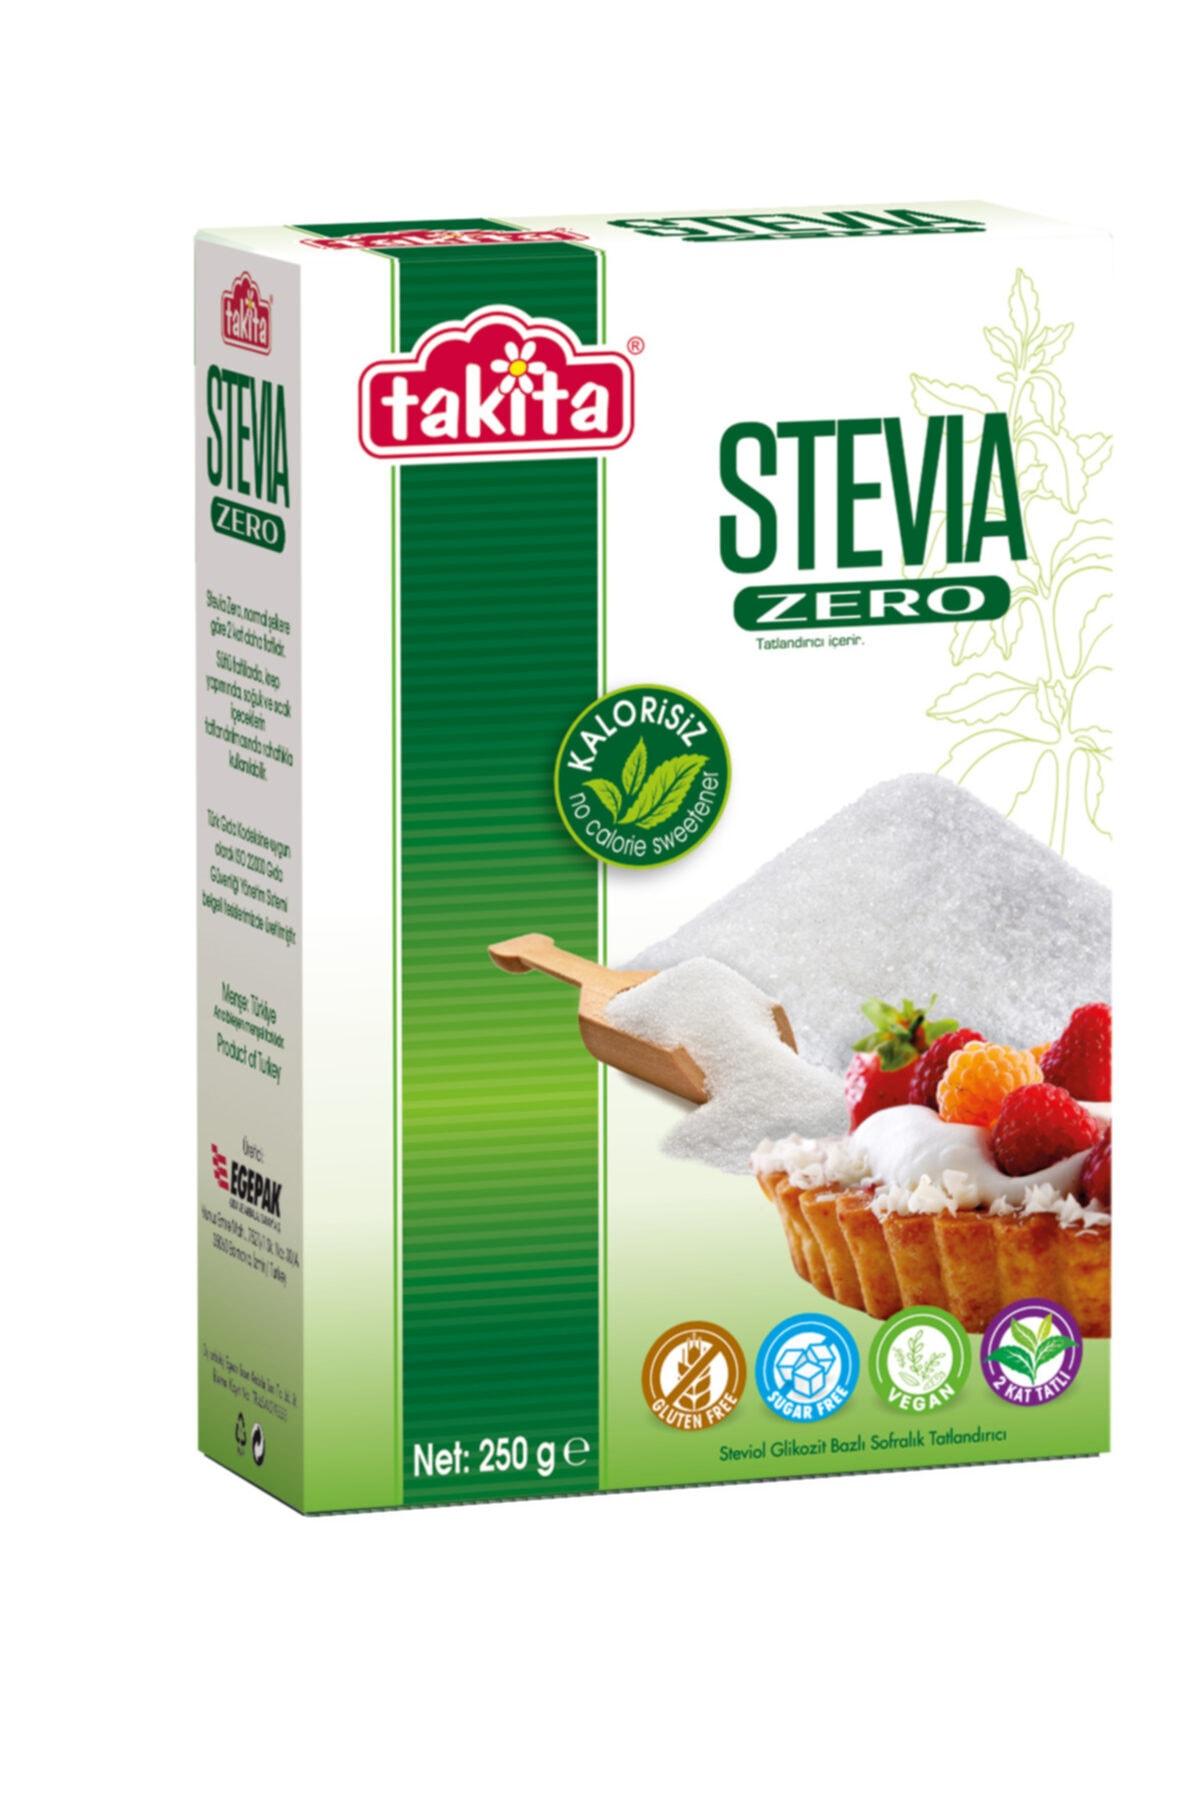 Takita Stevia Zero Toz Tatlandırıcı 250 G 1